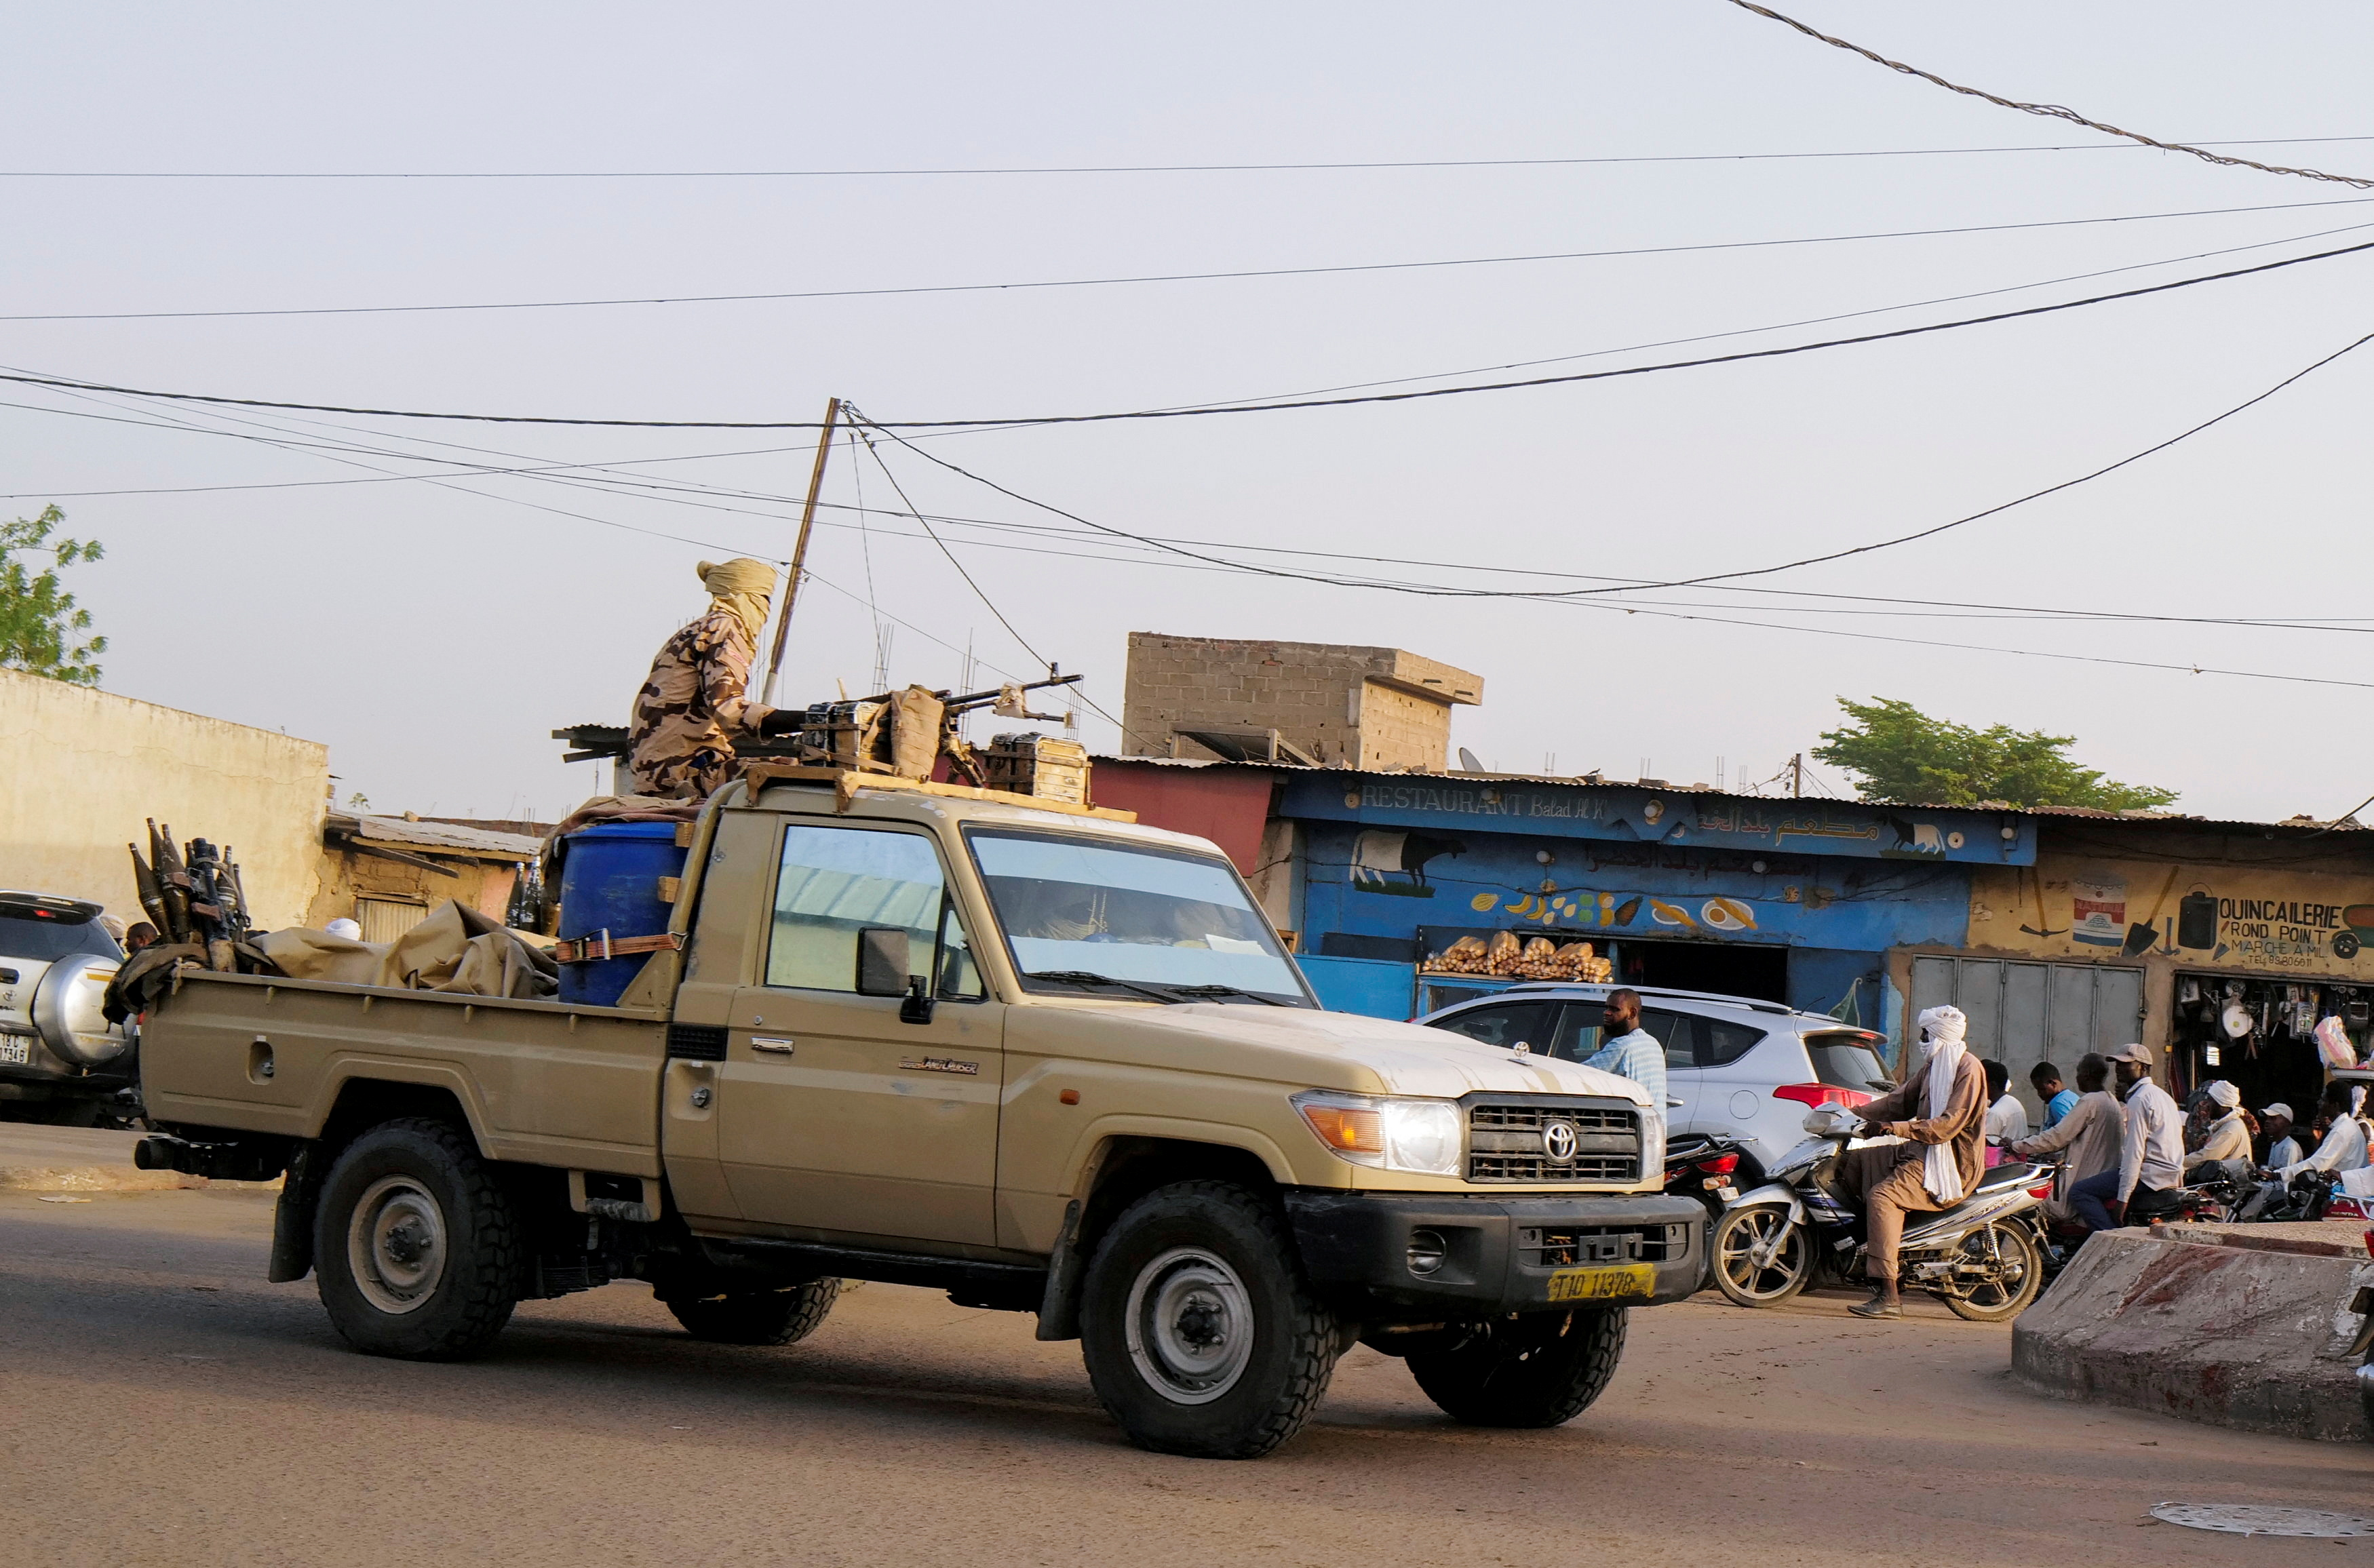 Members of the security forces patrol Chad's capital N'Djamena following the battlefield death of President Idriss Deby in N'Djamena, Chad April 26, 2021. REUTERS/Zohra Bensemra/File Photo